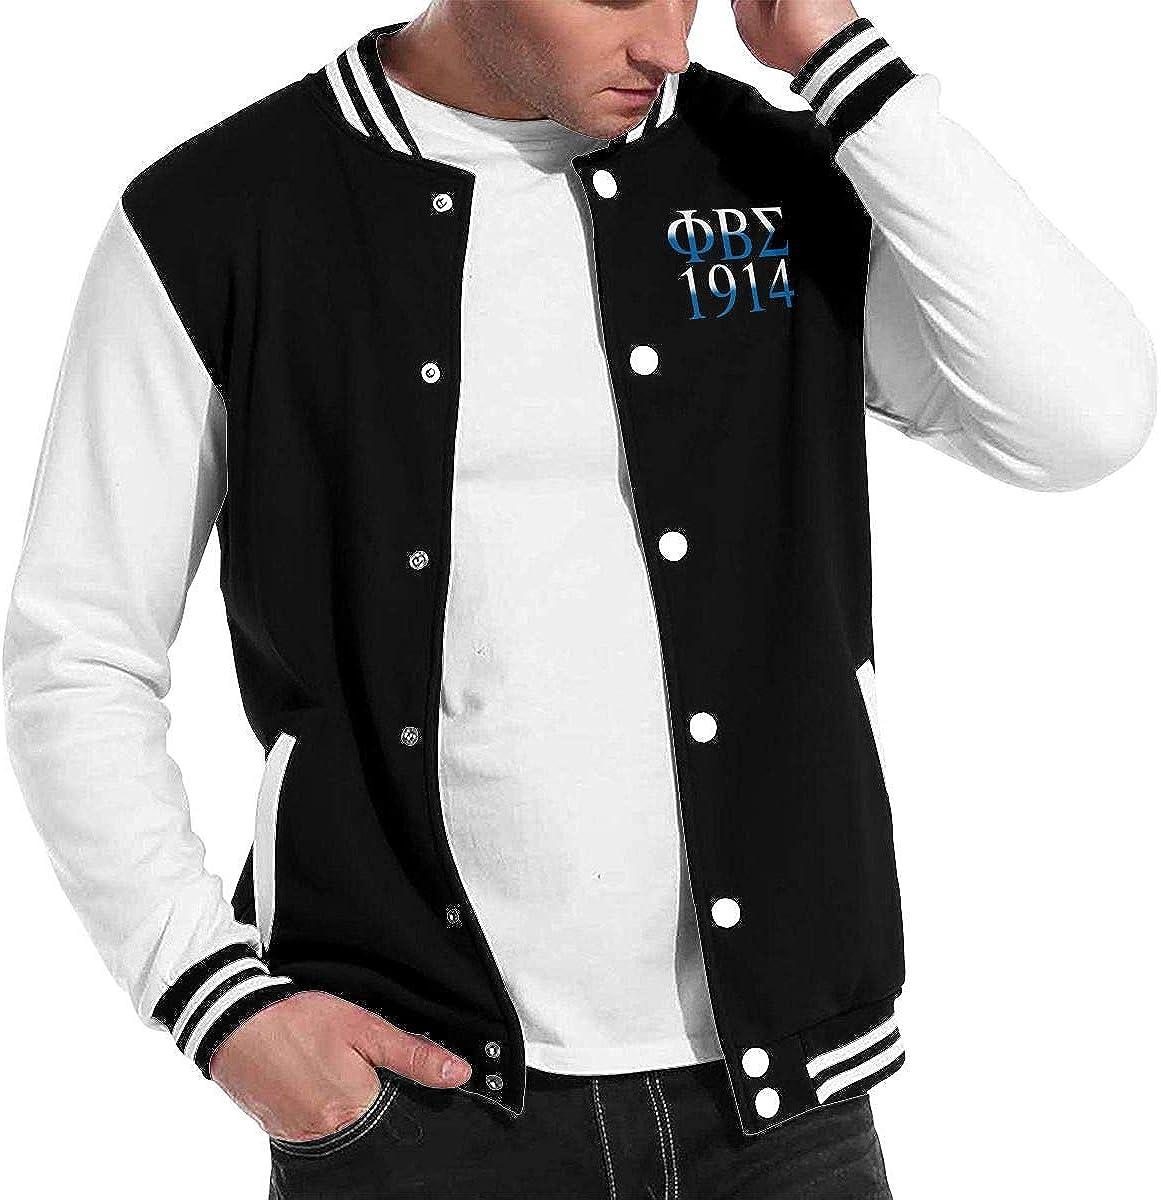 Phi Beta Sigma Baseball Jacket Mens Winter Thick Warm Baseball Uniform Coat